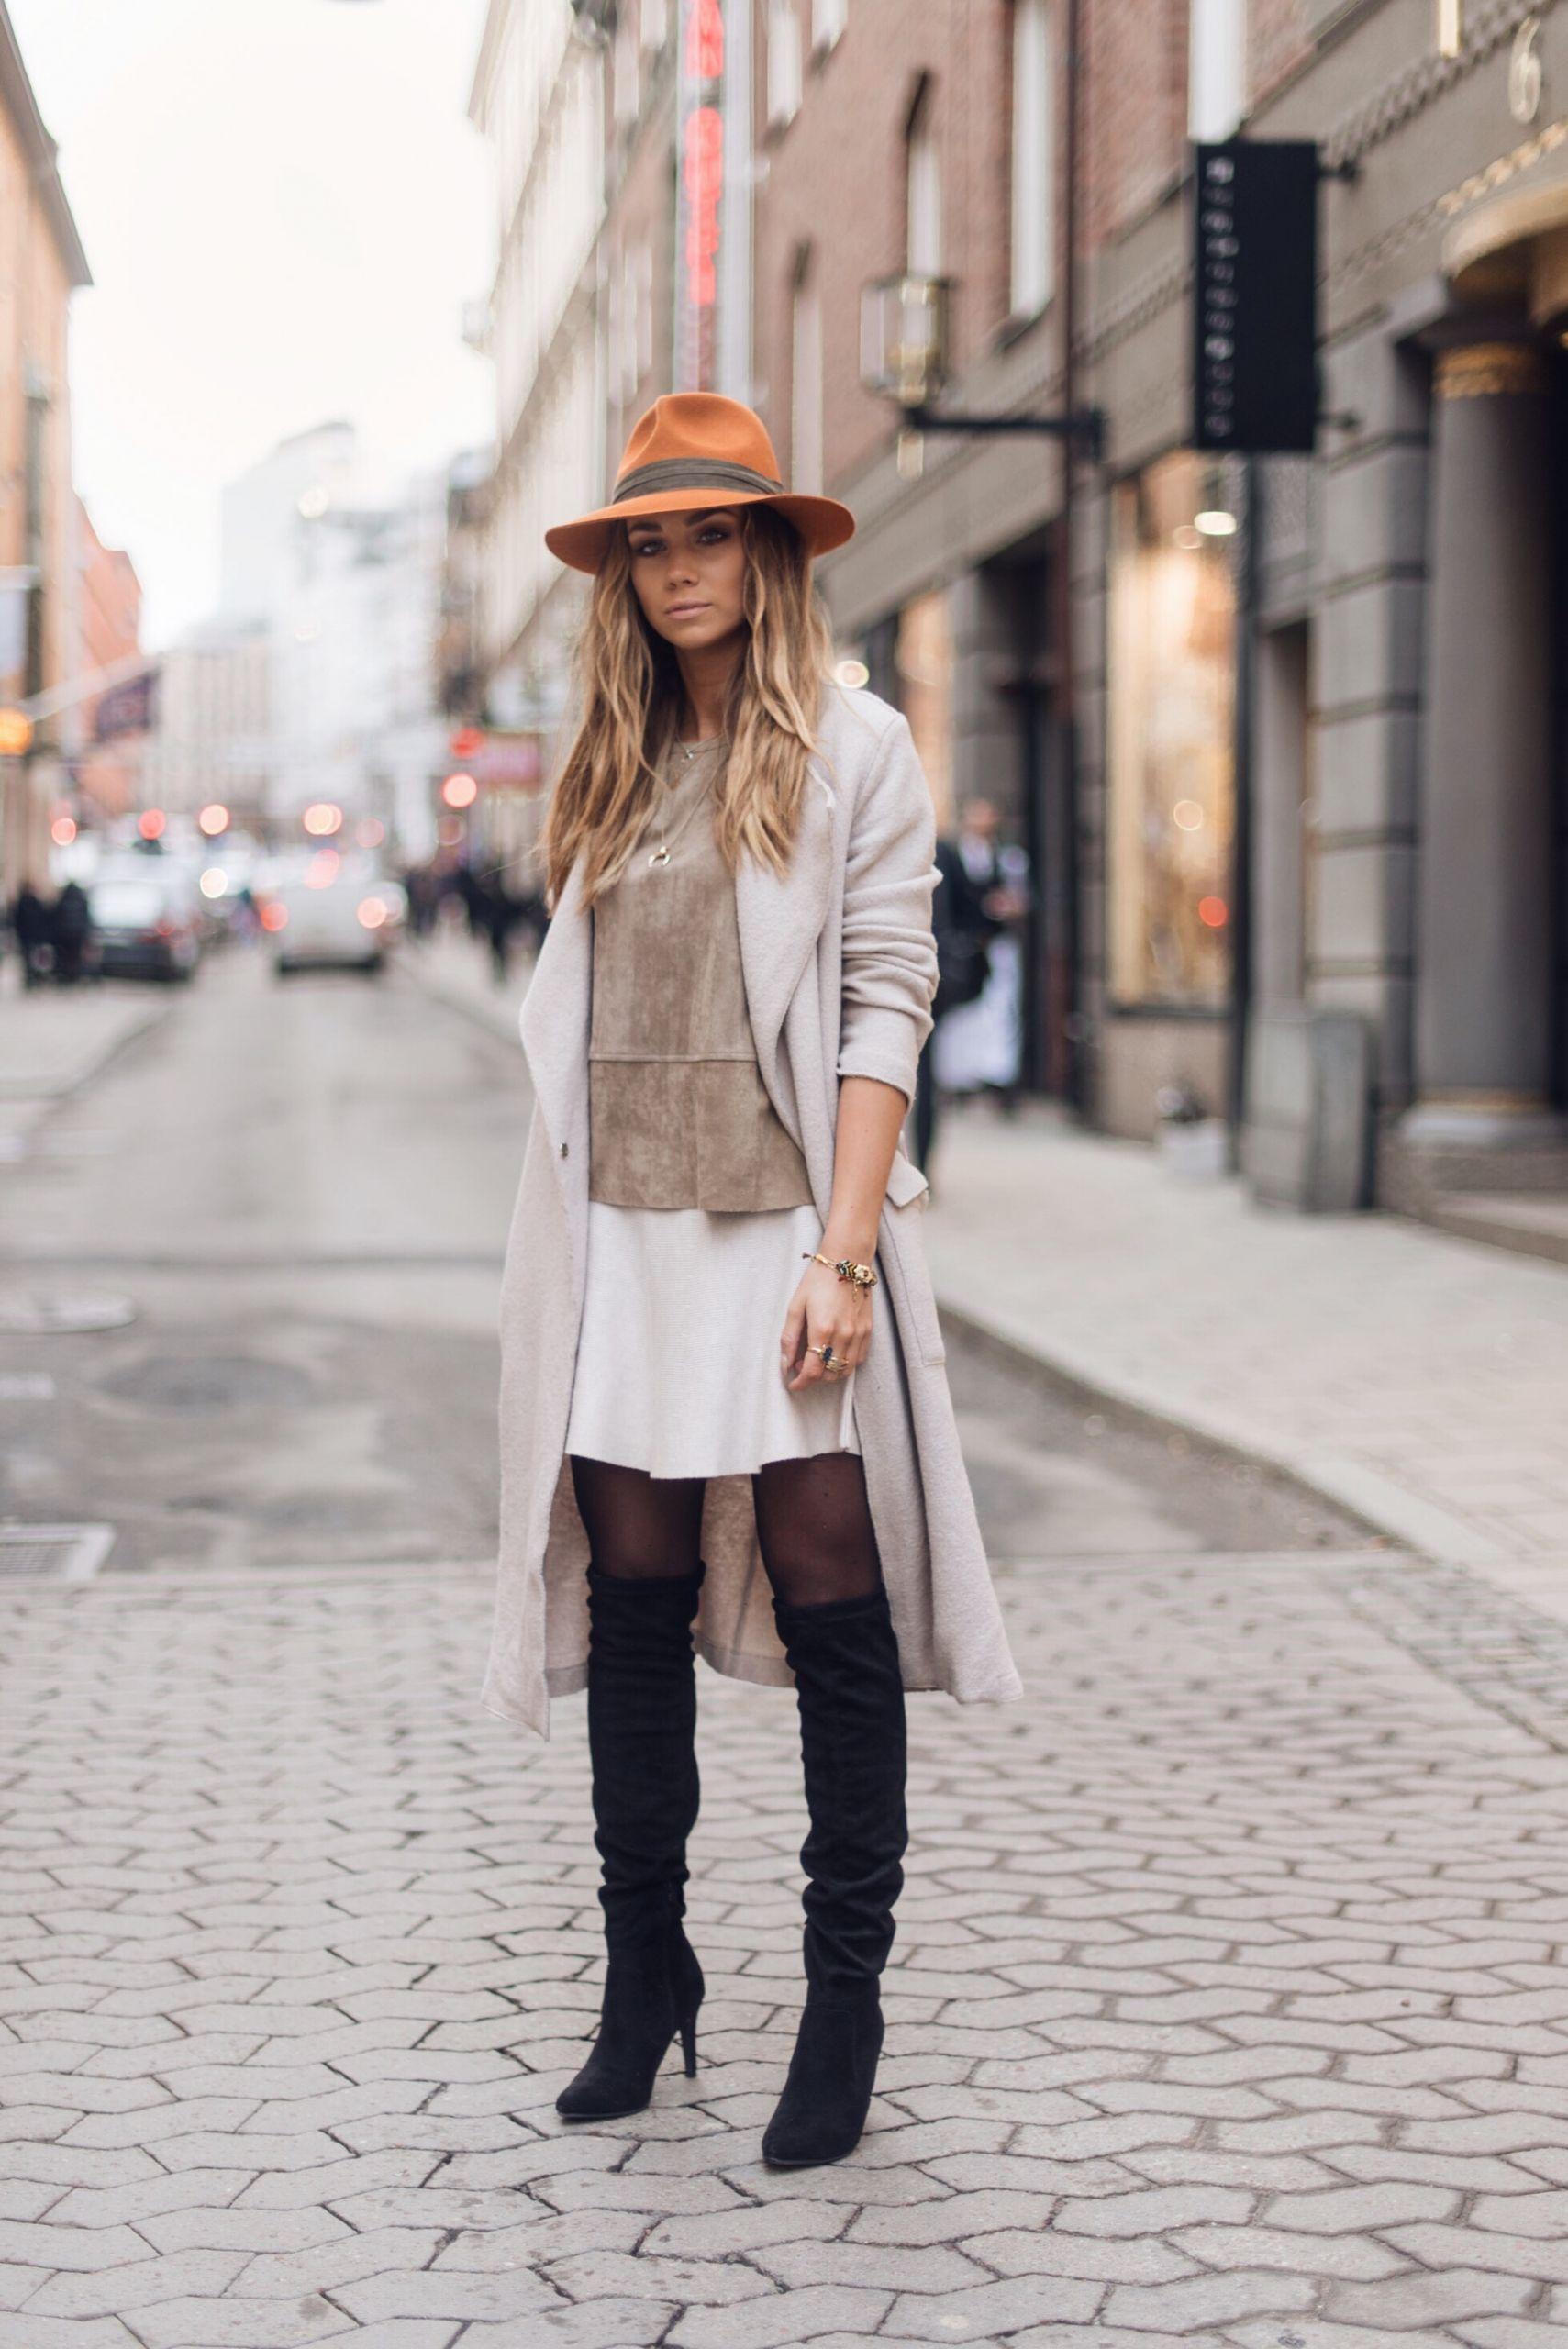 Filippa Coat Noir Shoes Tricot Din K Neo Top Gina sko Skirt zqAWw7